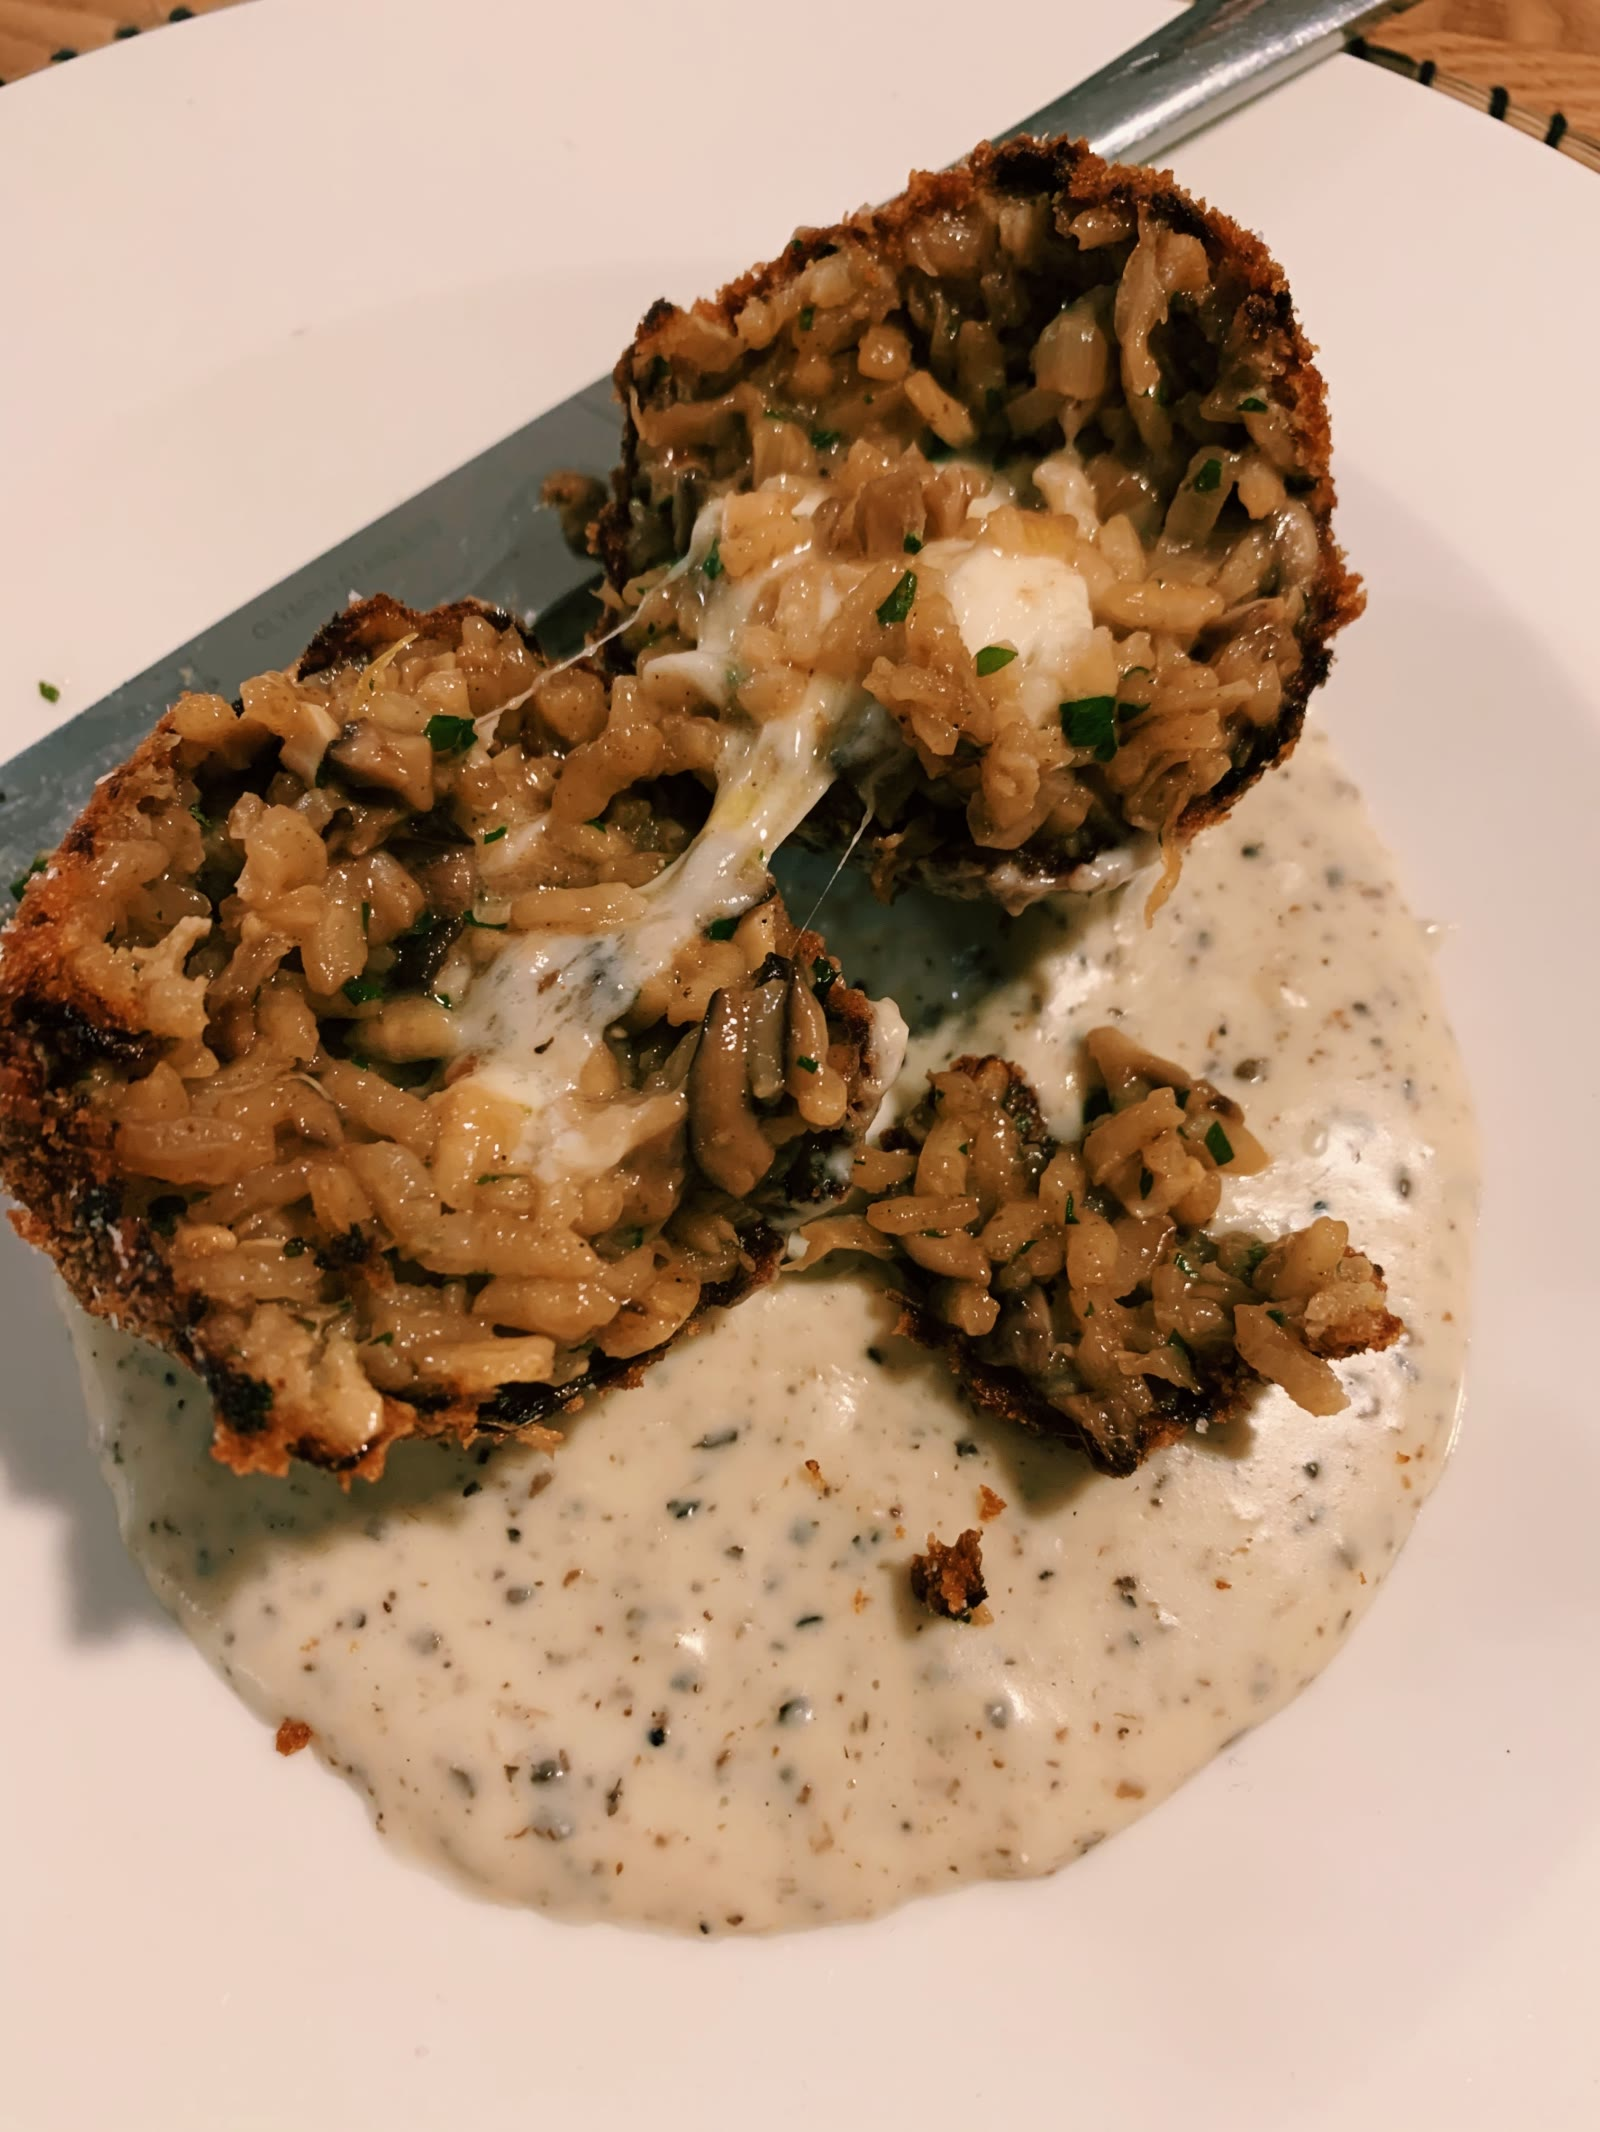 Wild Mushroom Arancini with Truffle Sauce